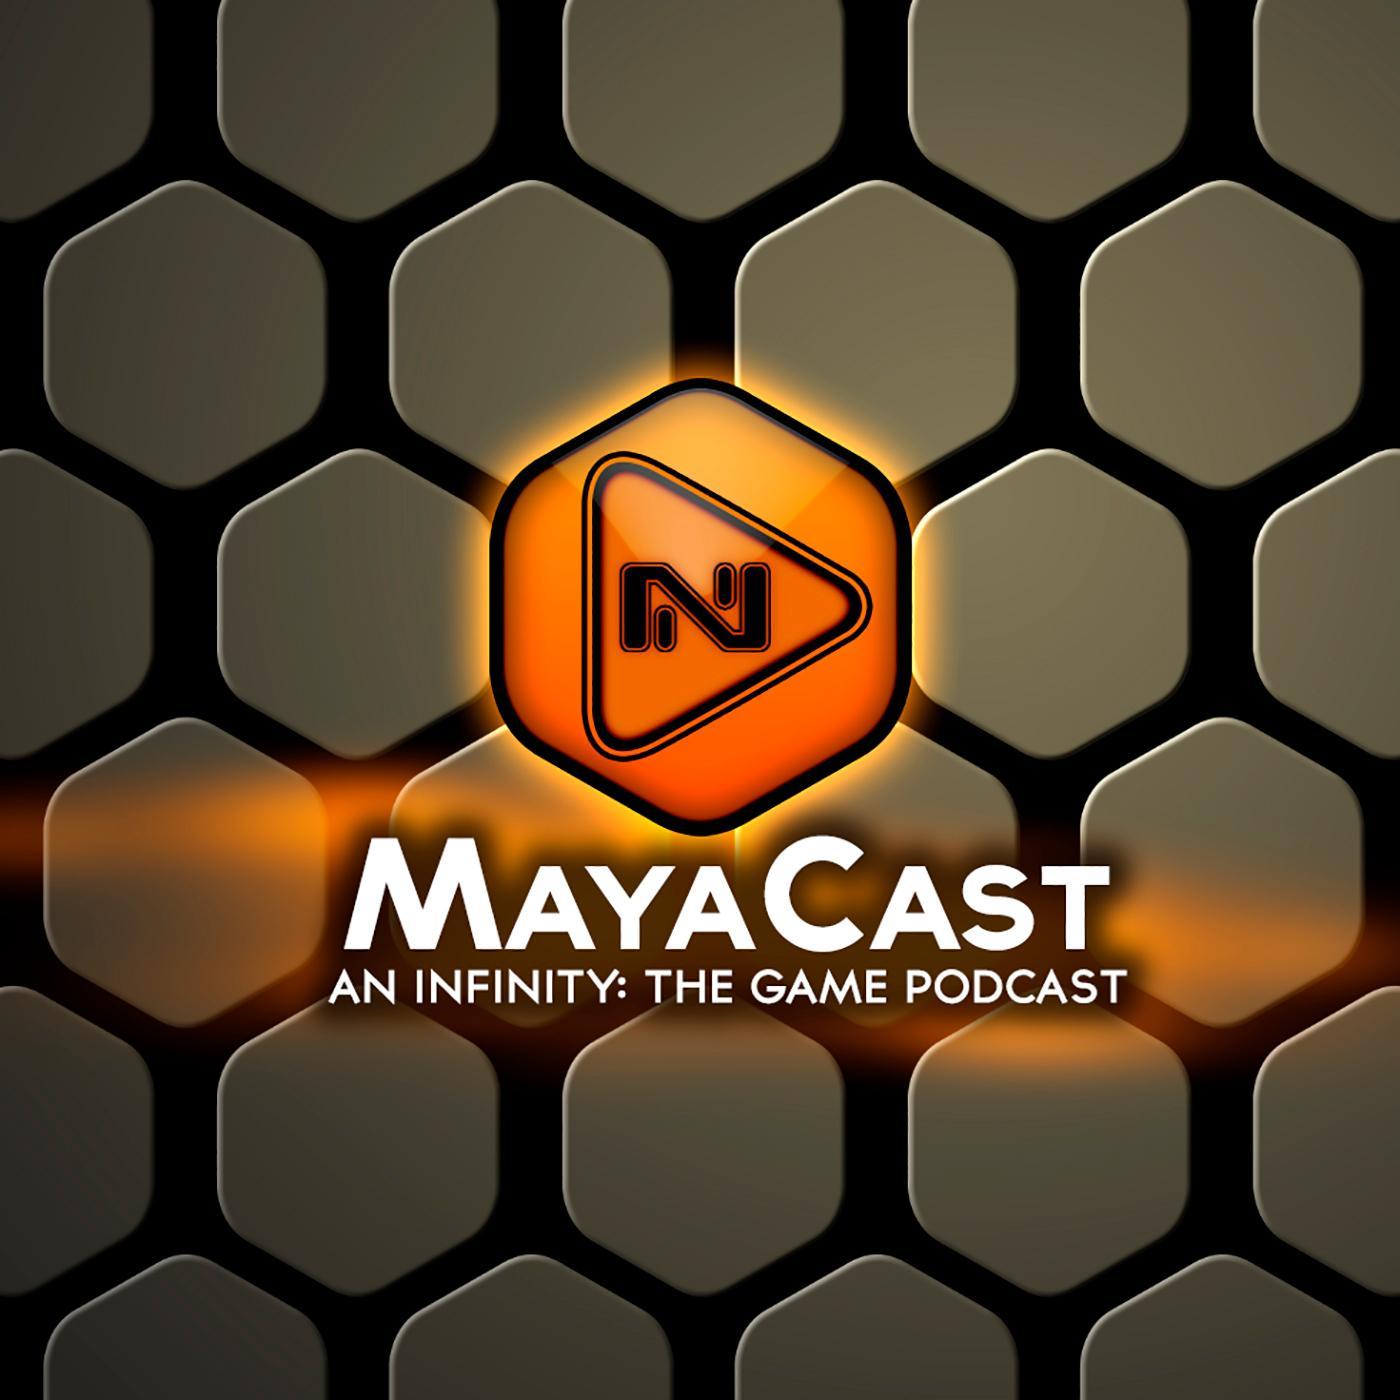 MayaCast Episode 115: Mail-Bag Brigada